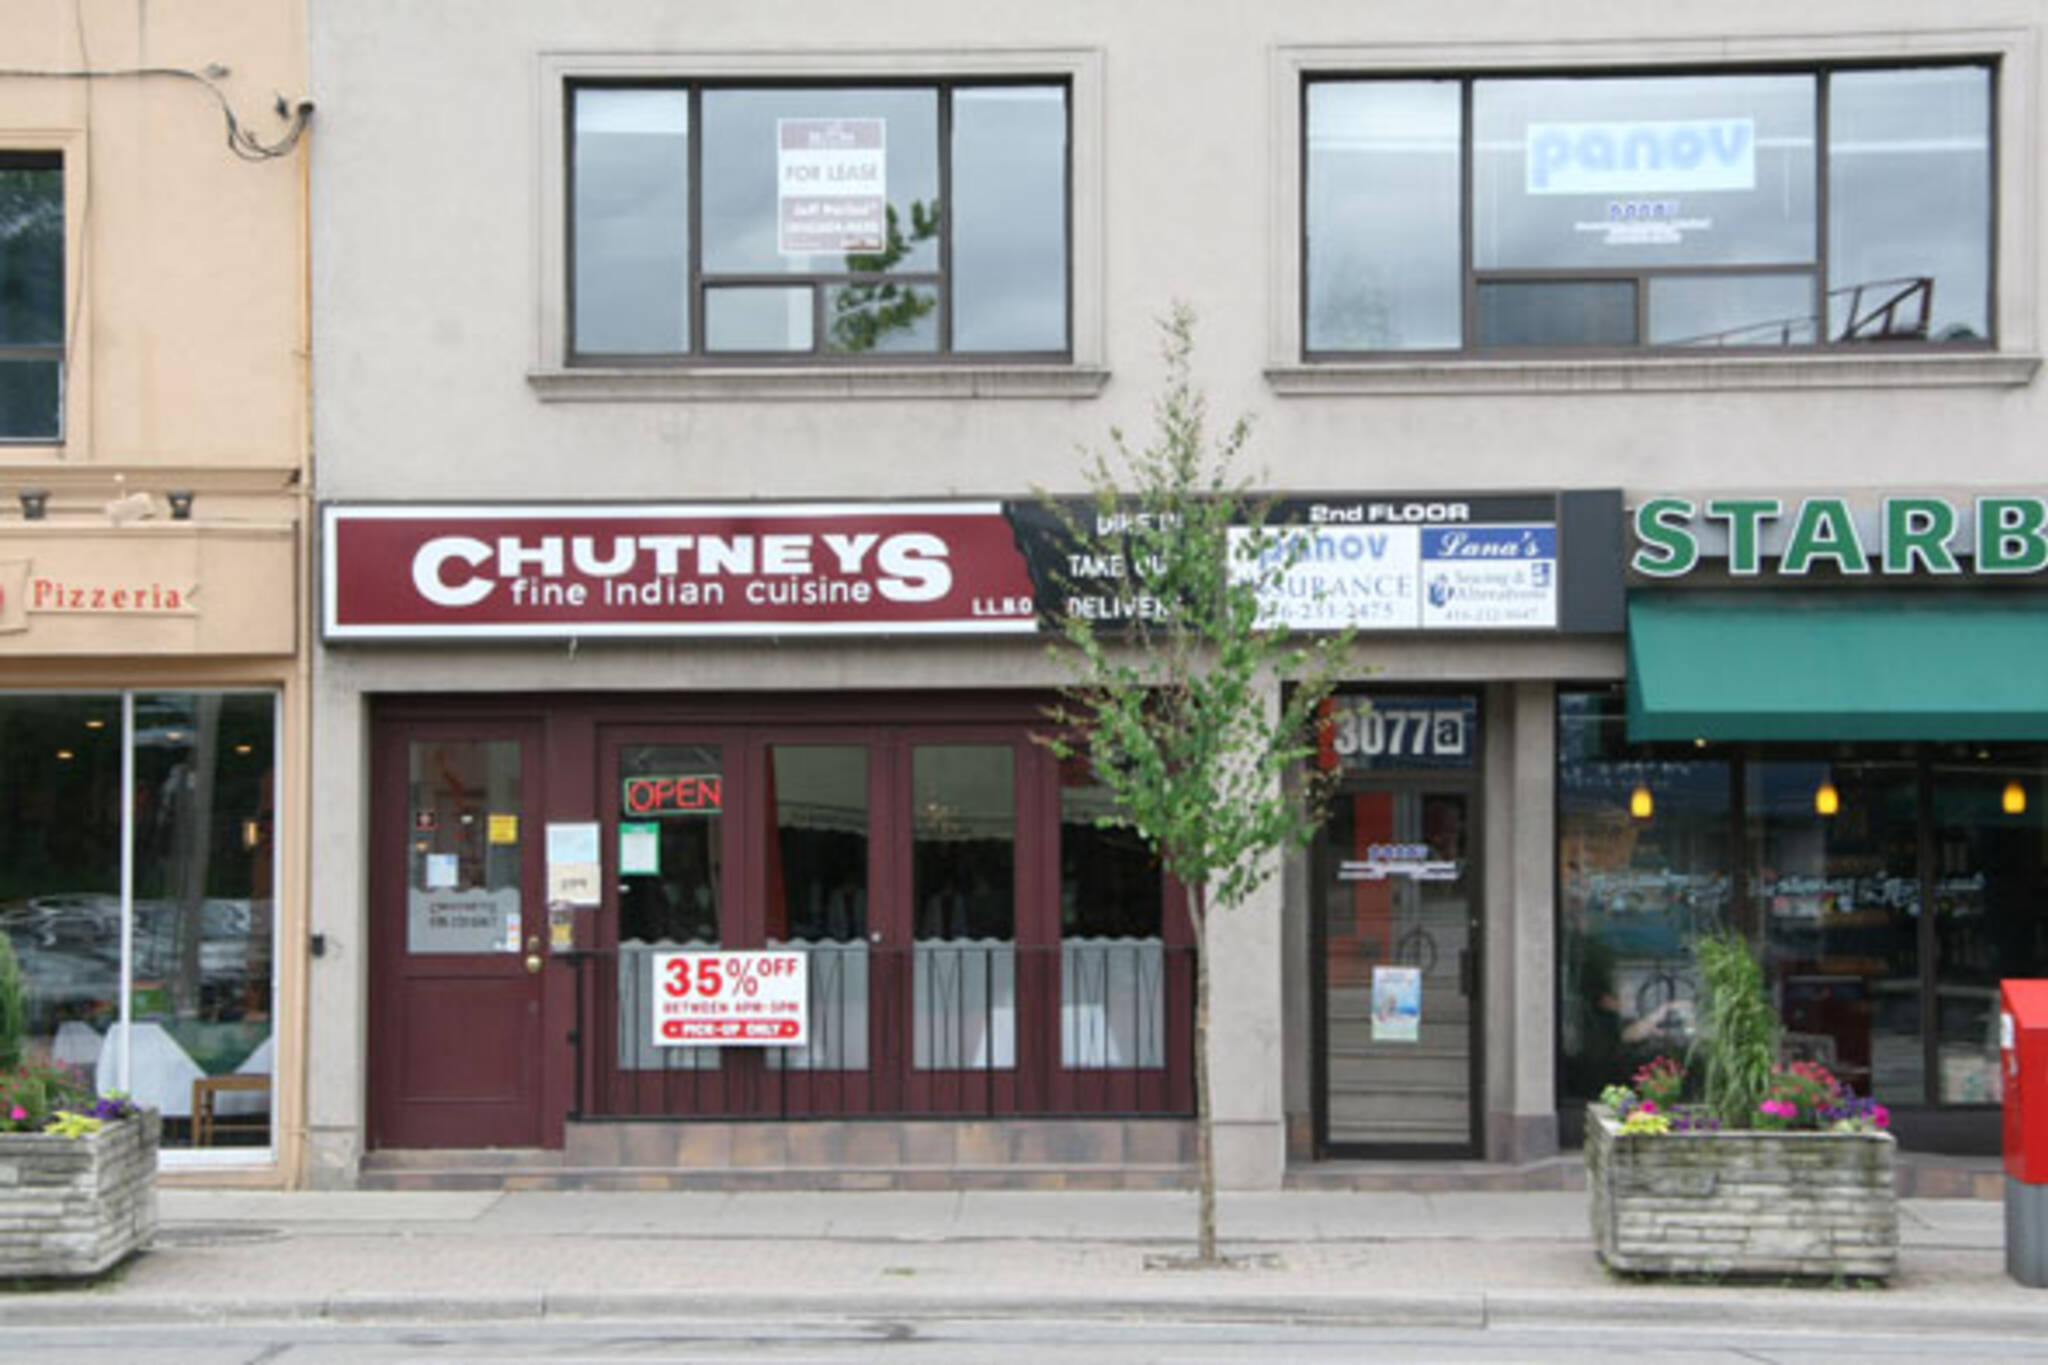 Chutney's Toronto